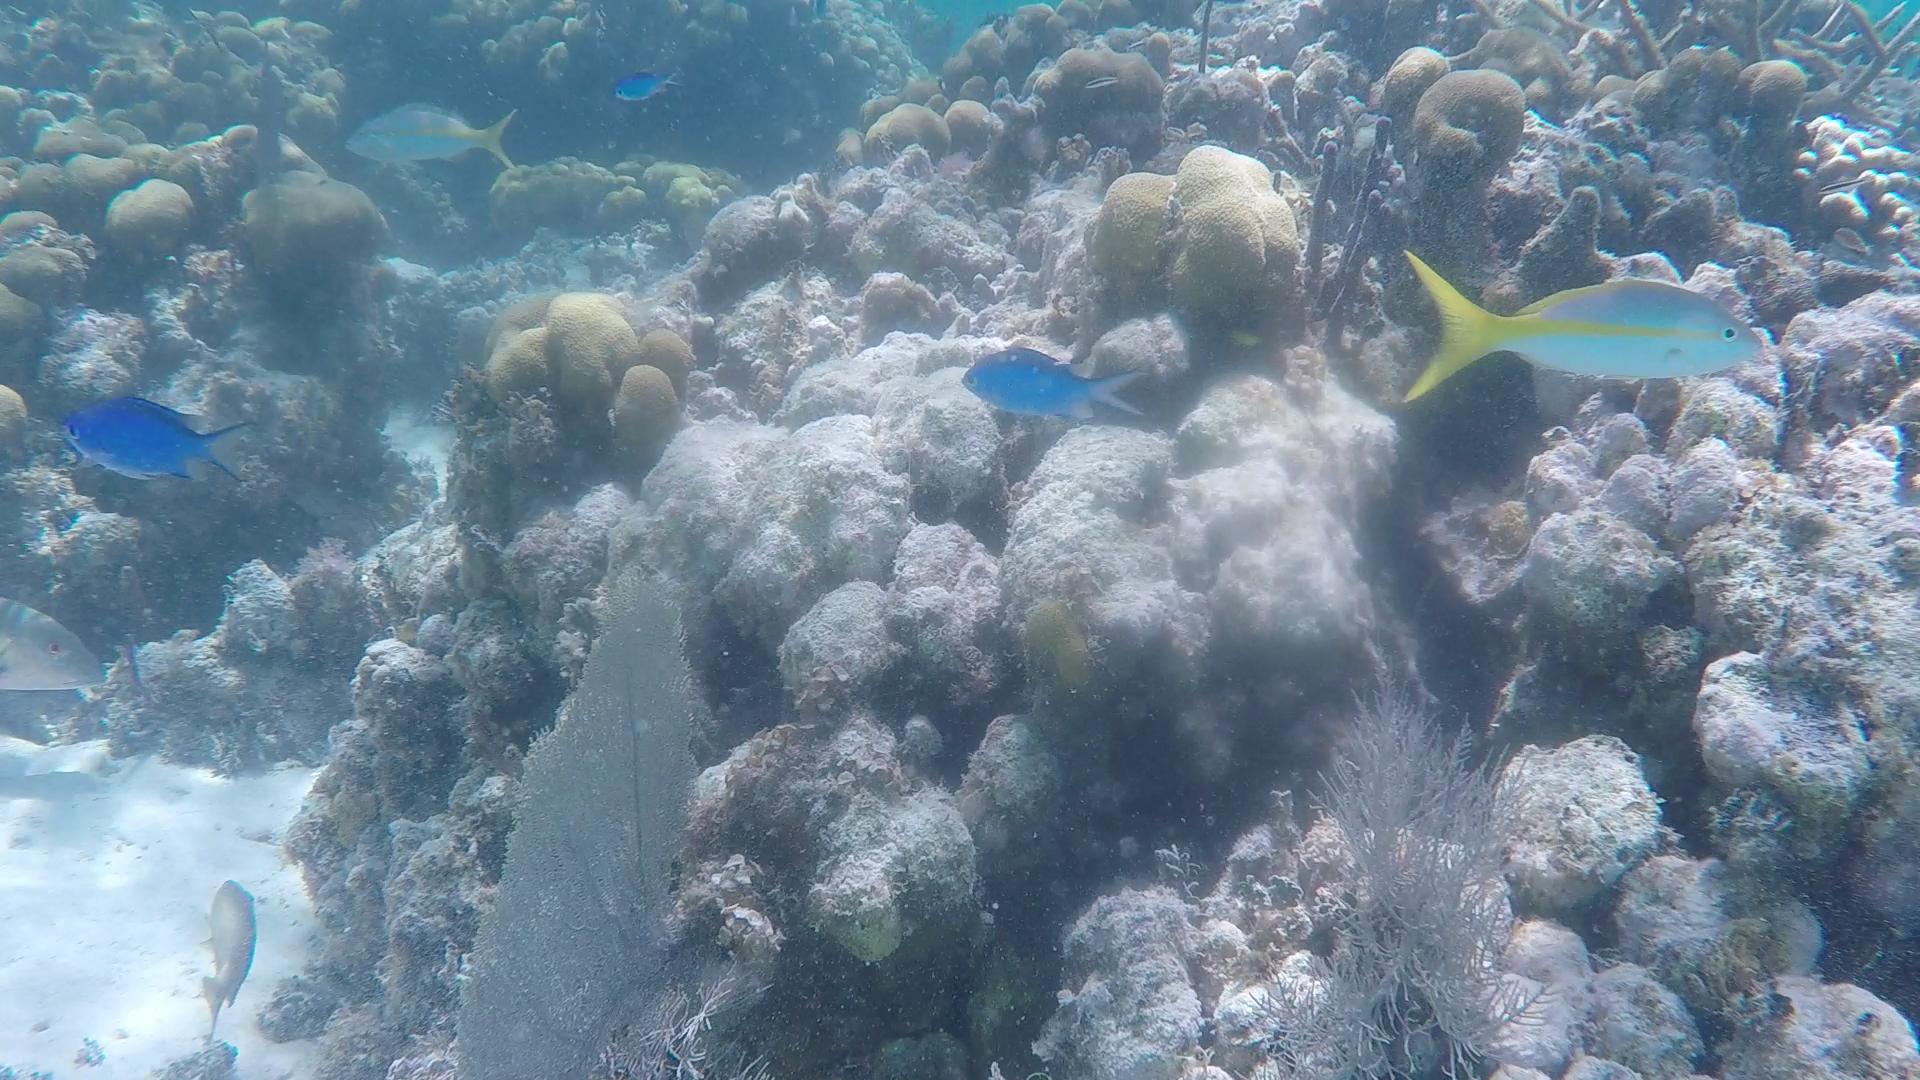 colorful fish caye caulker snorkeling.png